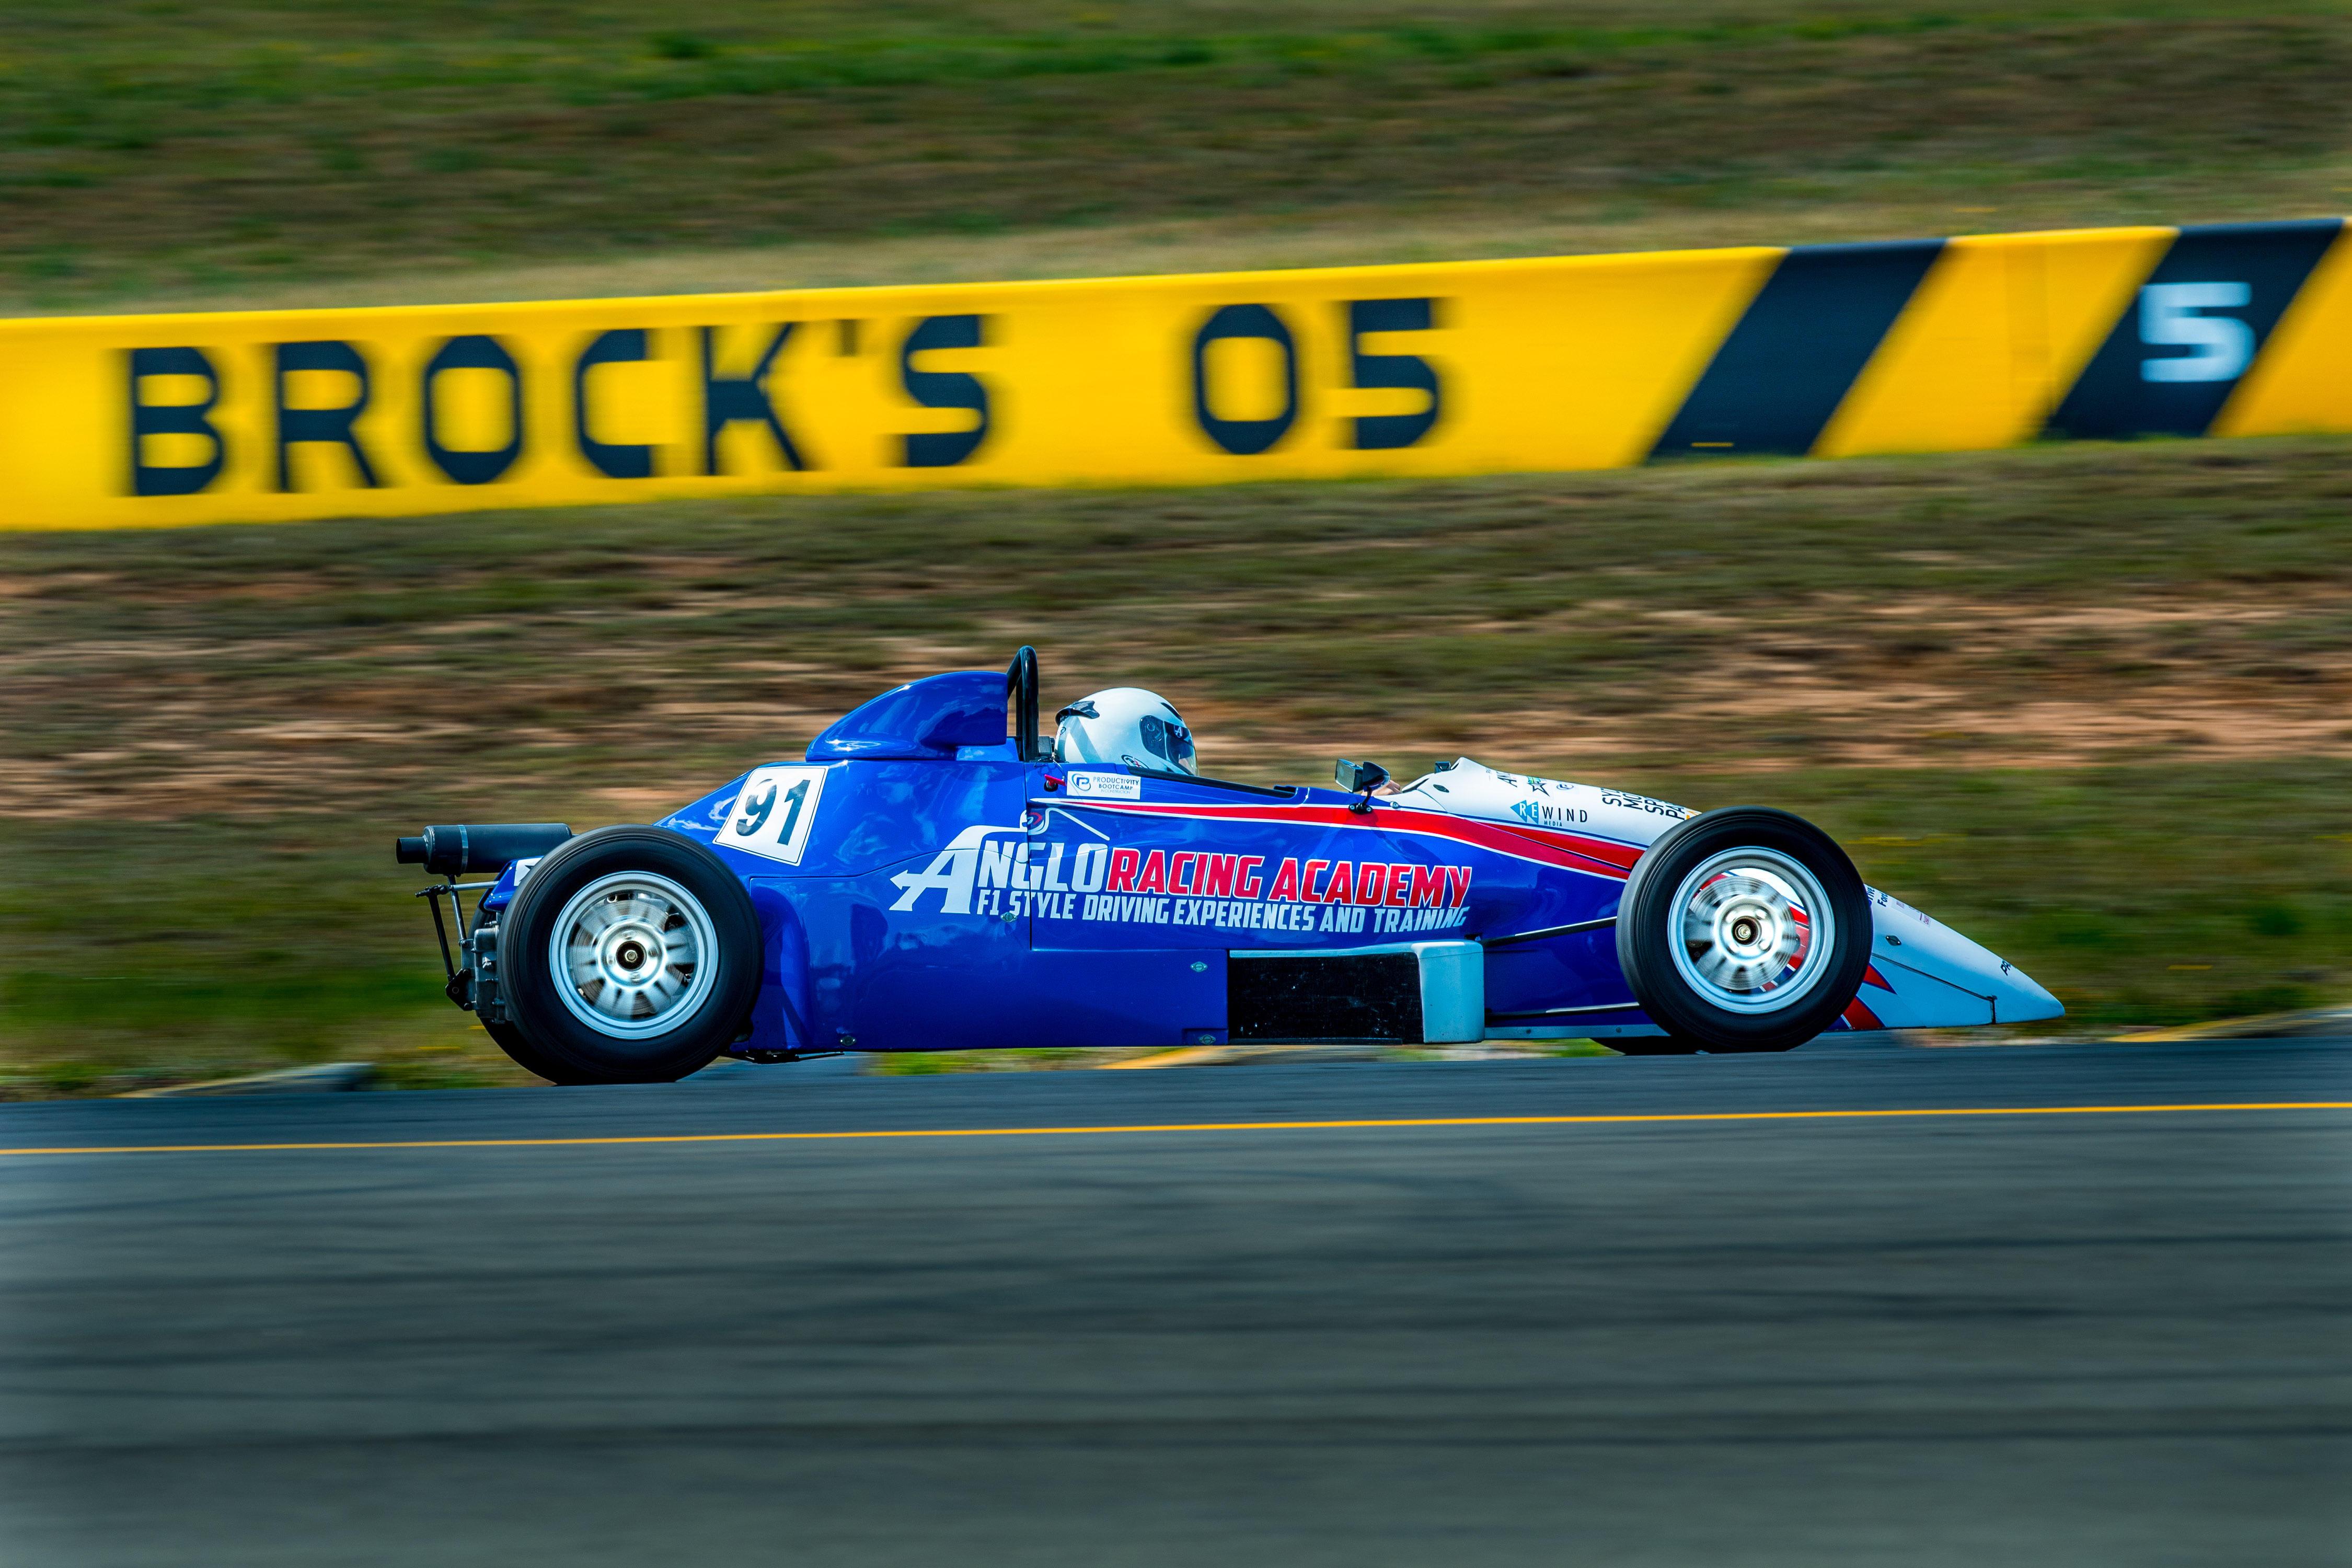 Drive an F1 Style Race Car, 24 Laps - Wakefield Park, Goulburn